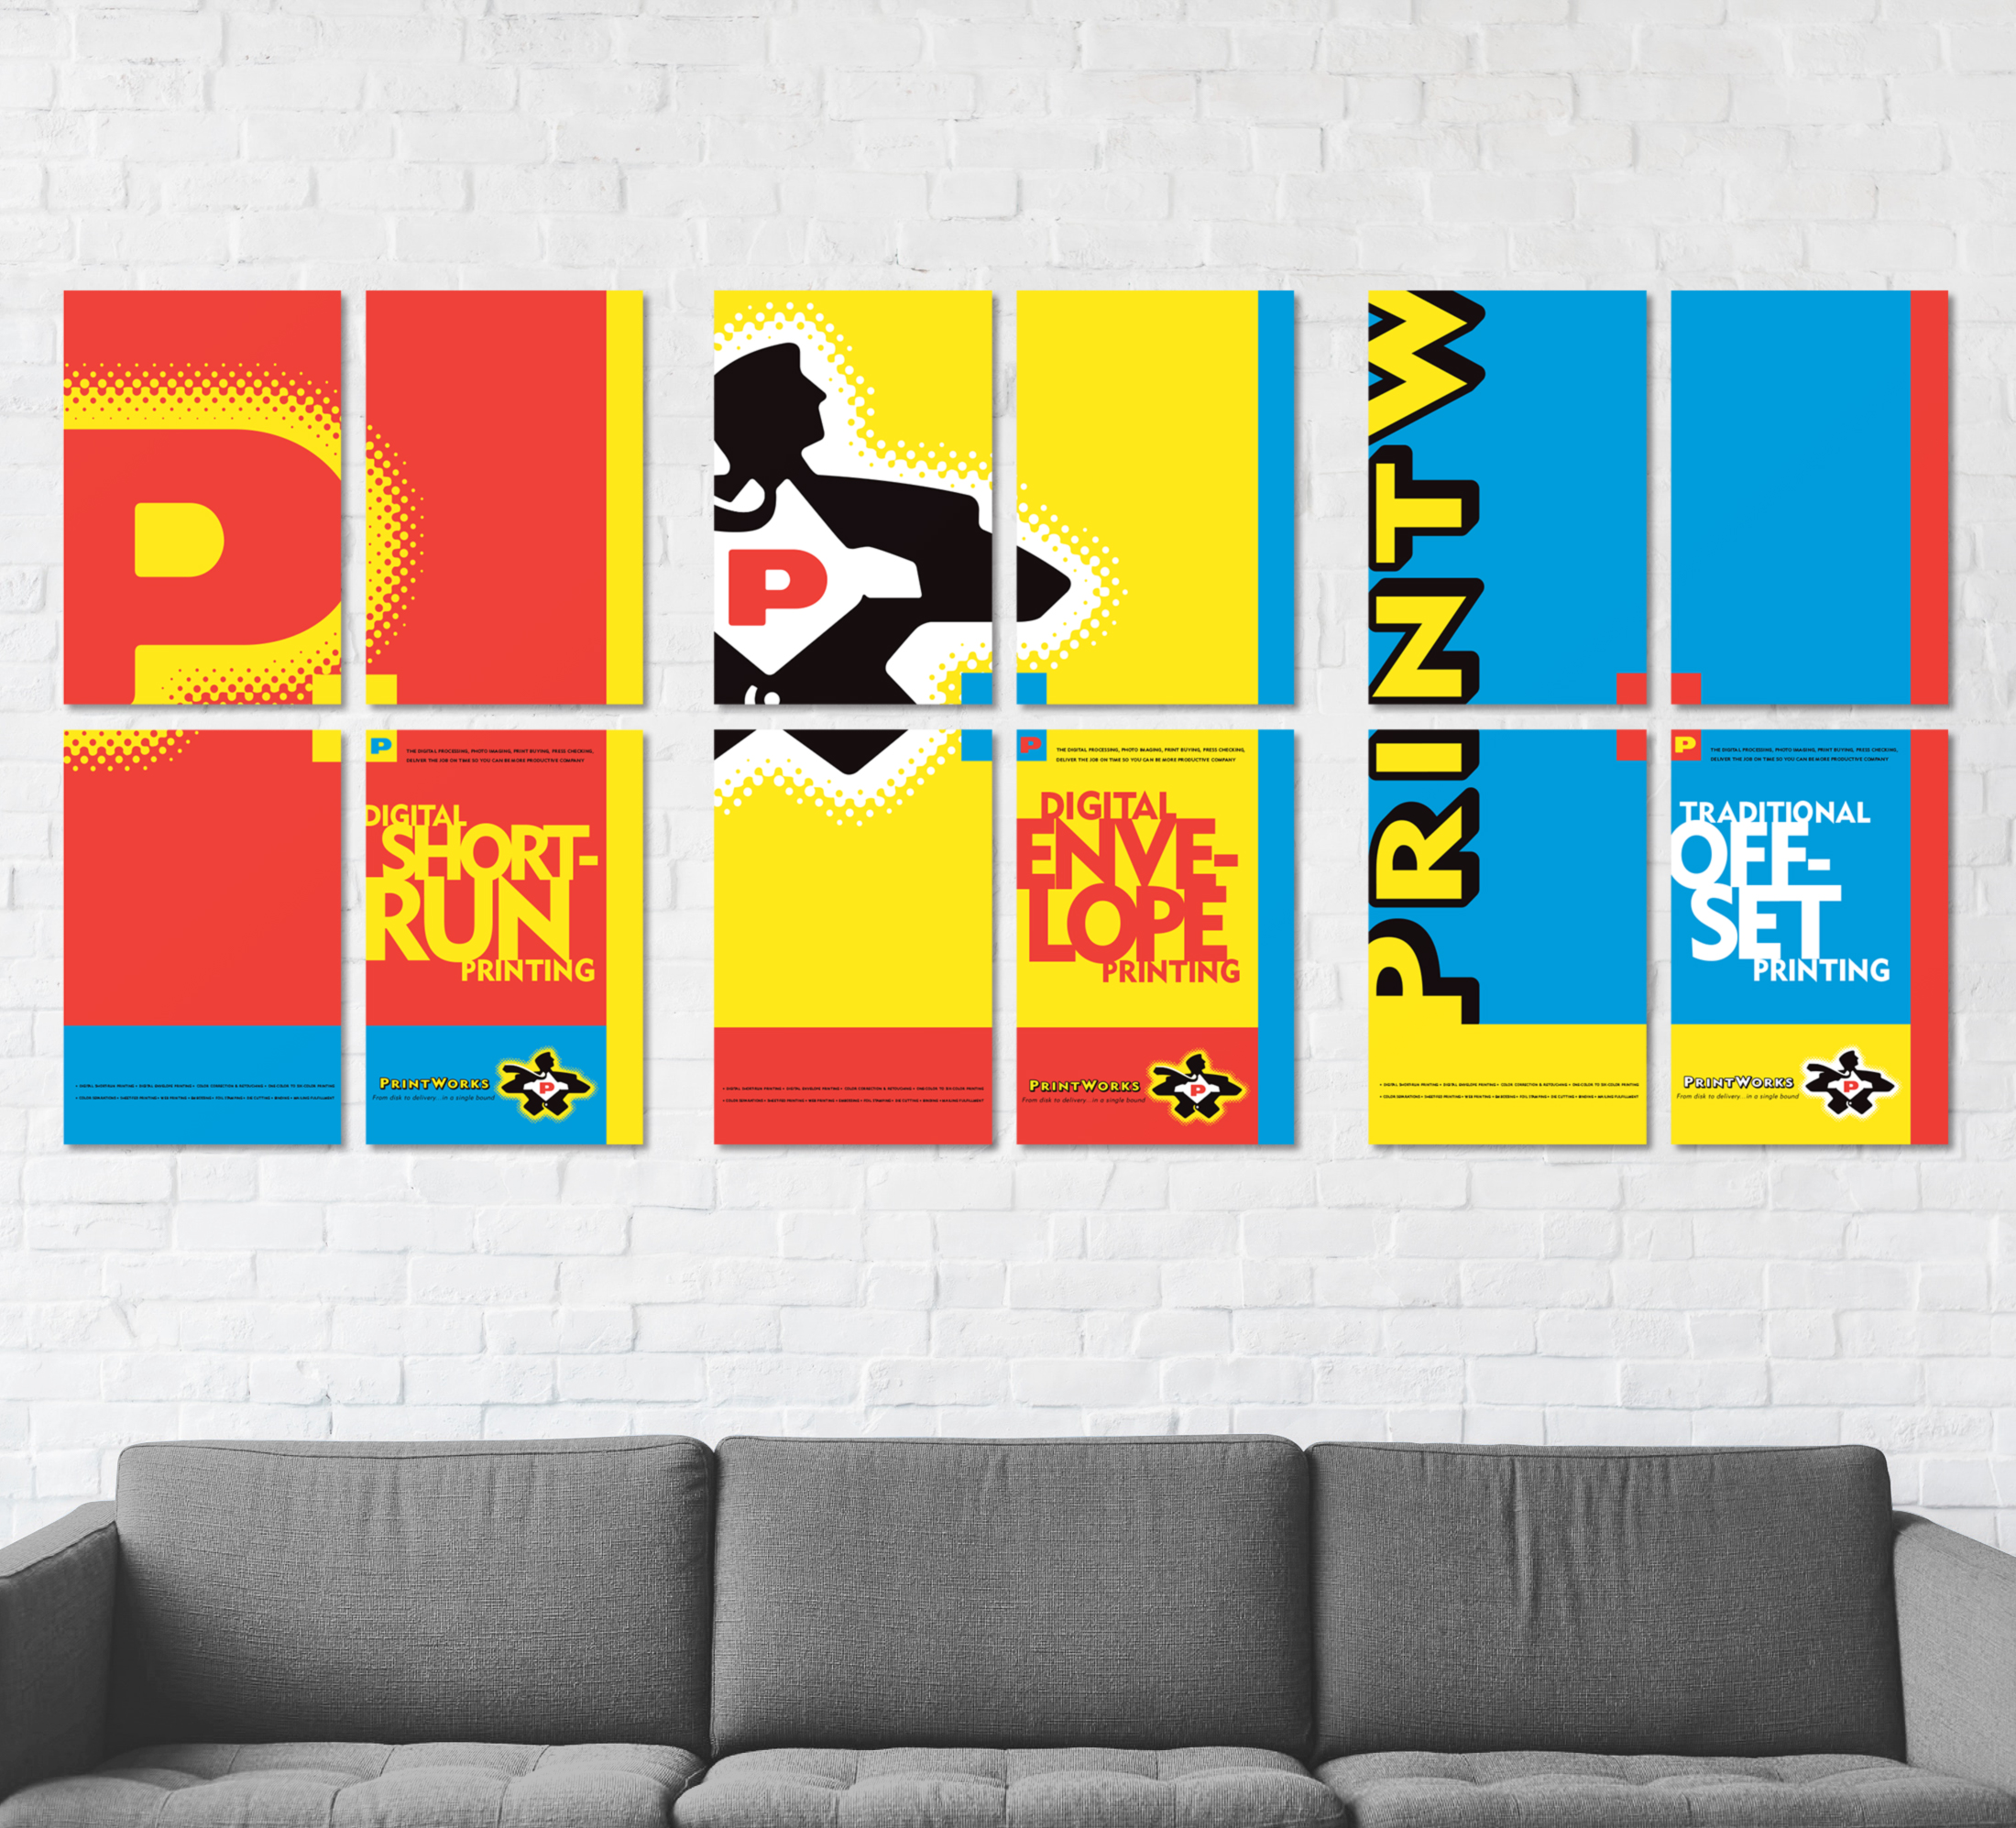 PrintWorks Signage © Robertson Design